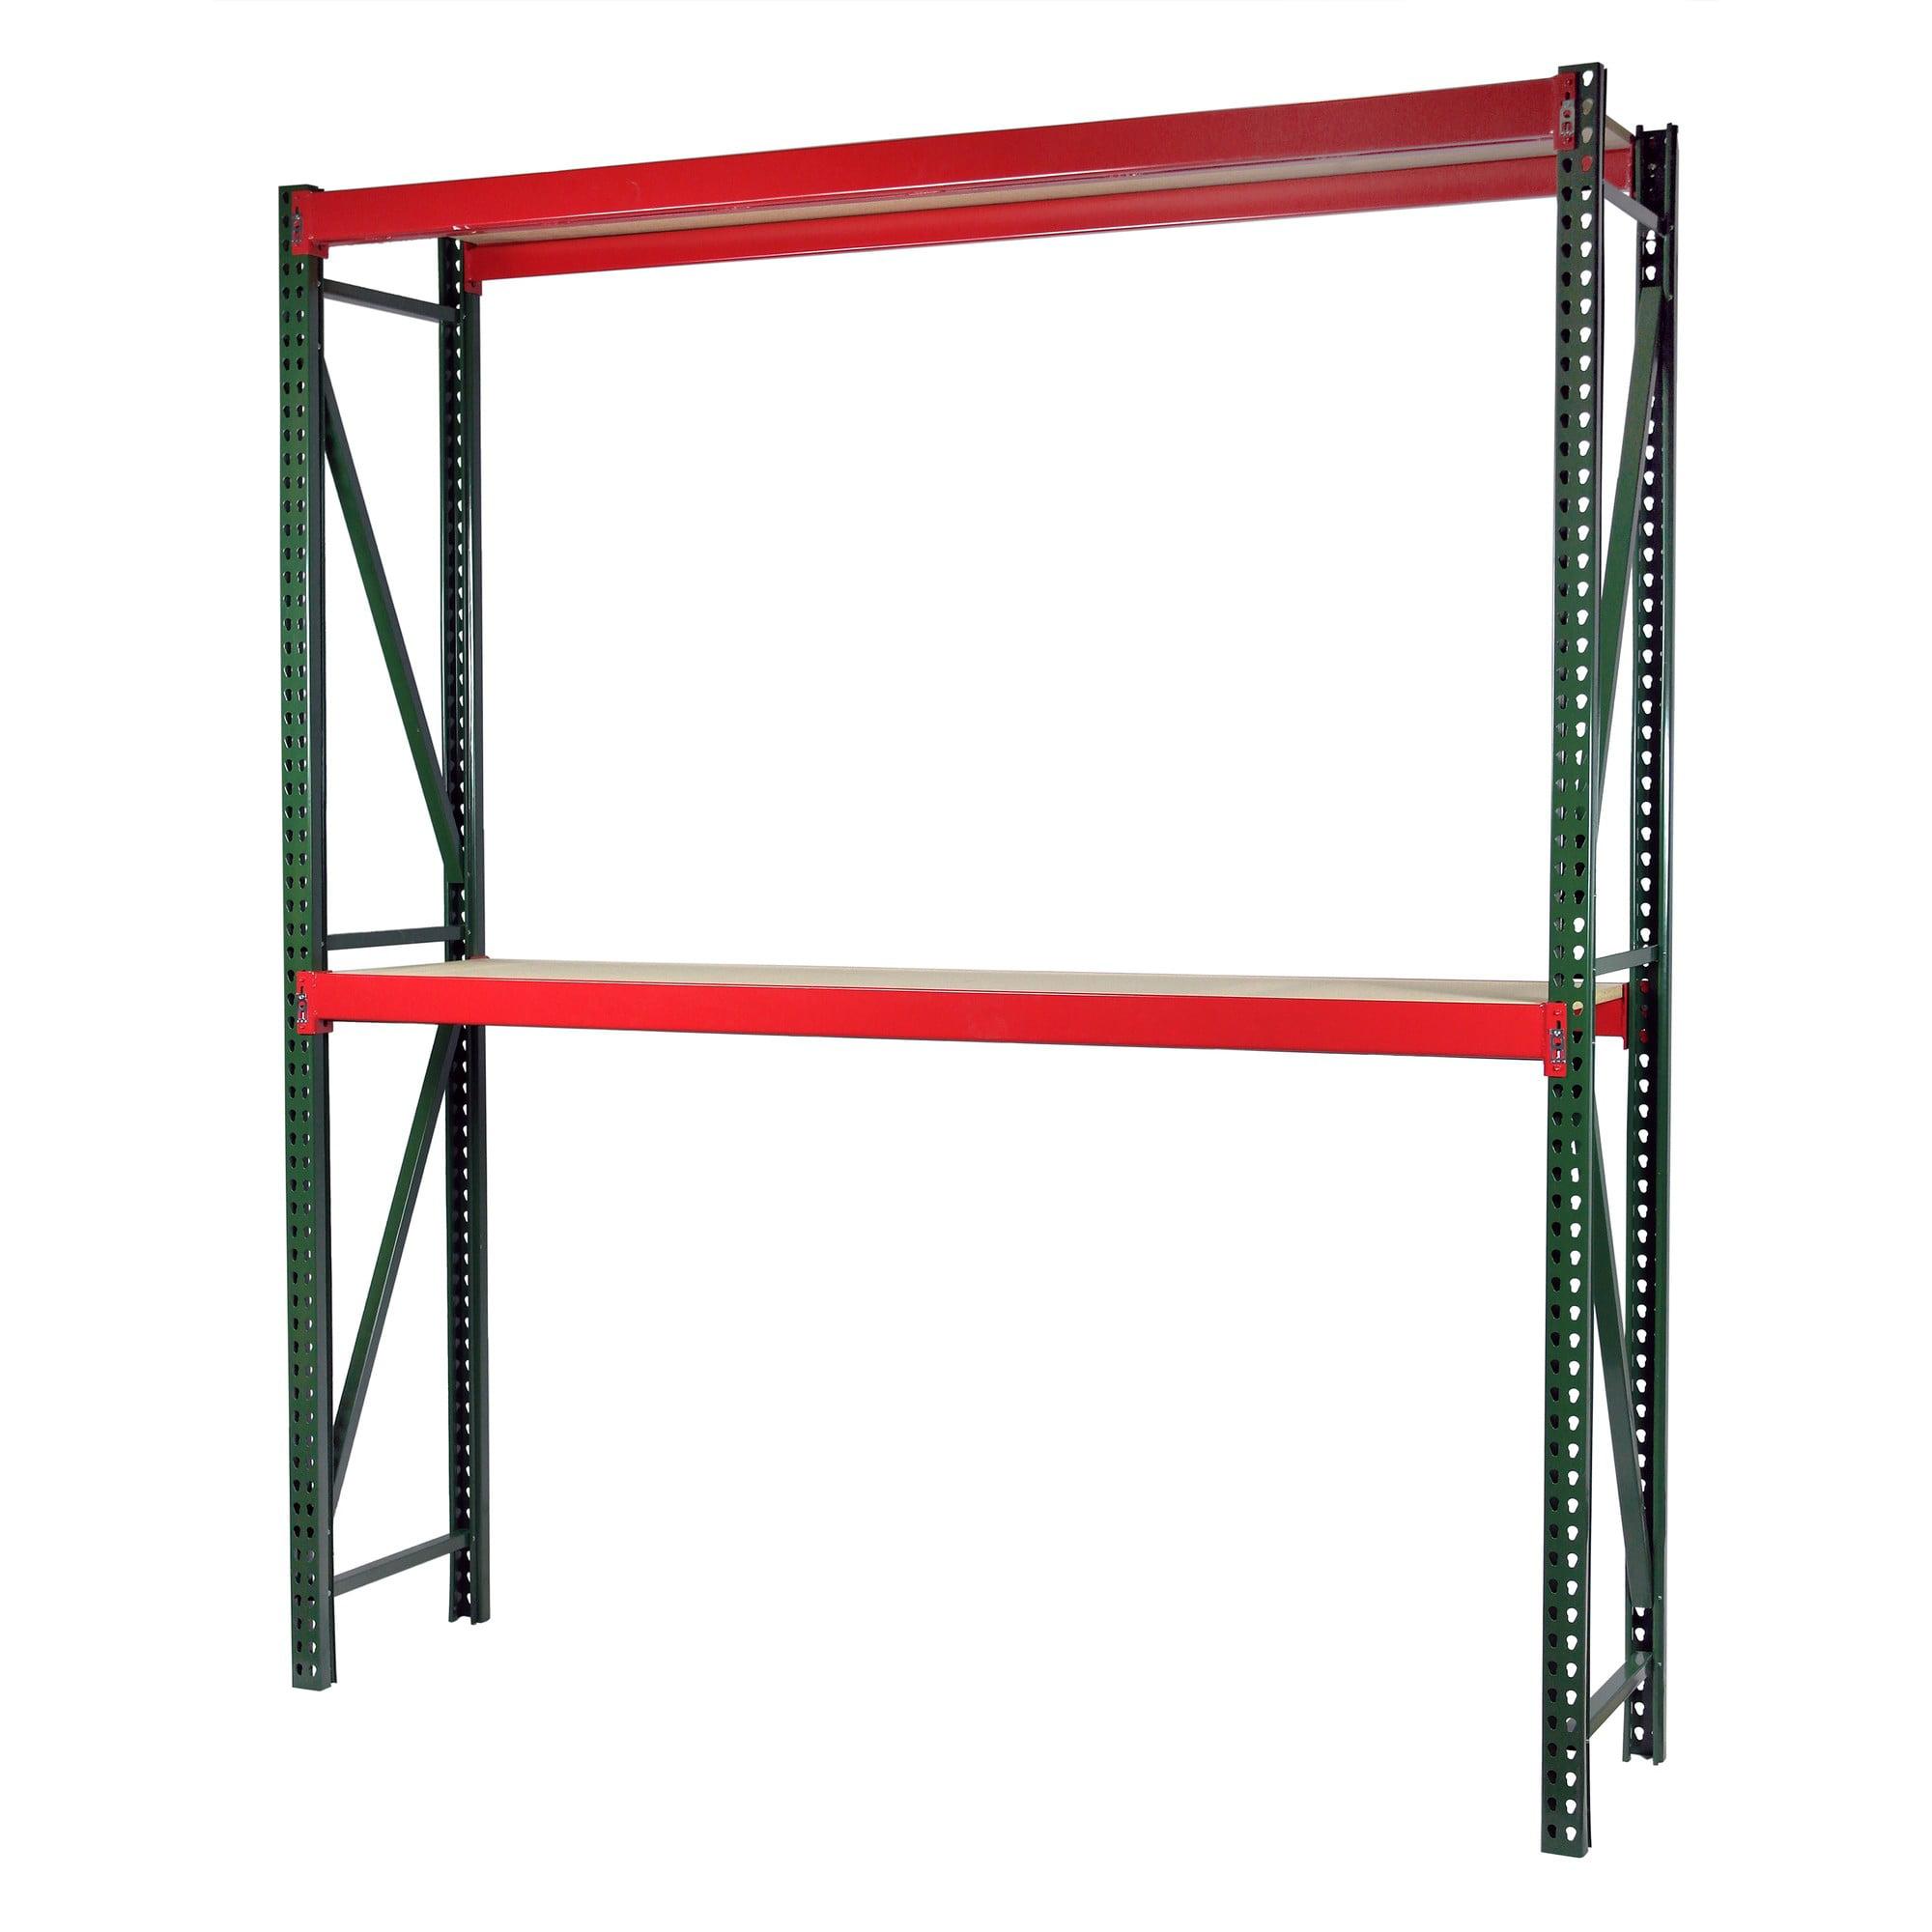 Storage Max Bulk Rack Shelving, 96 x 48 x 120, Heavy Duty